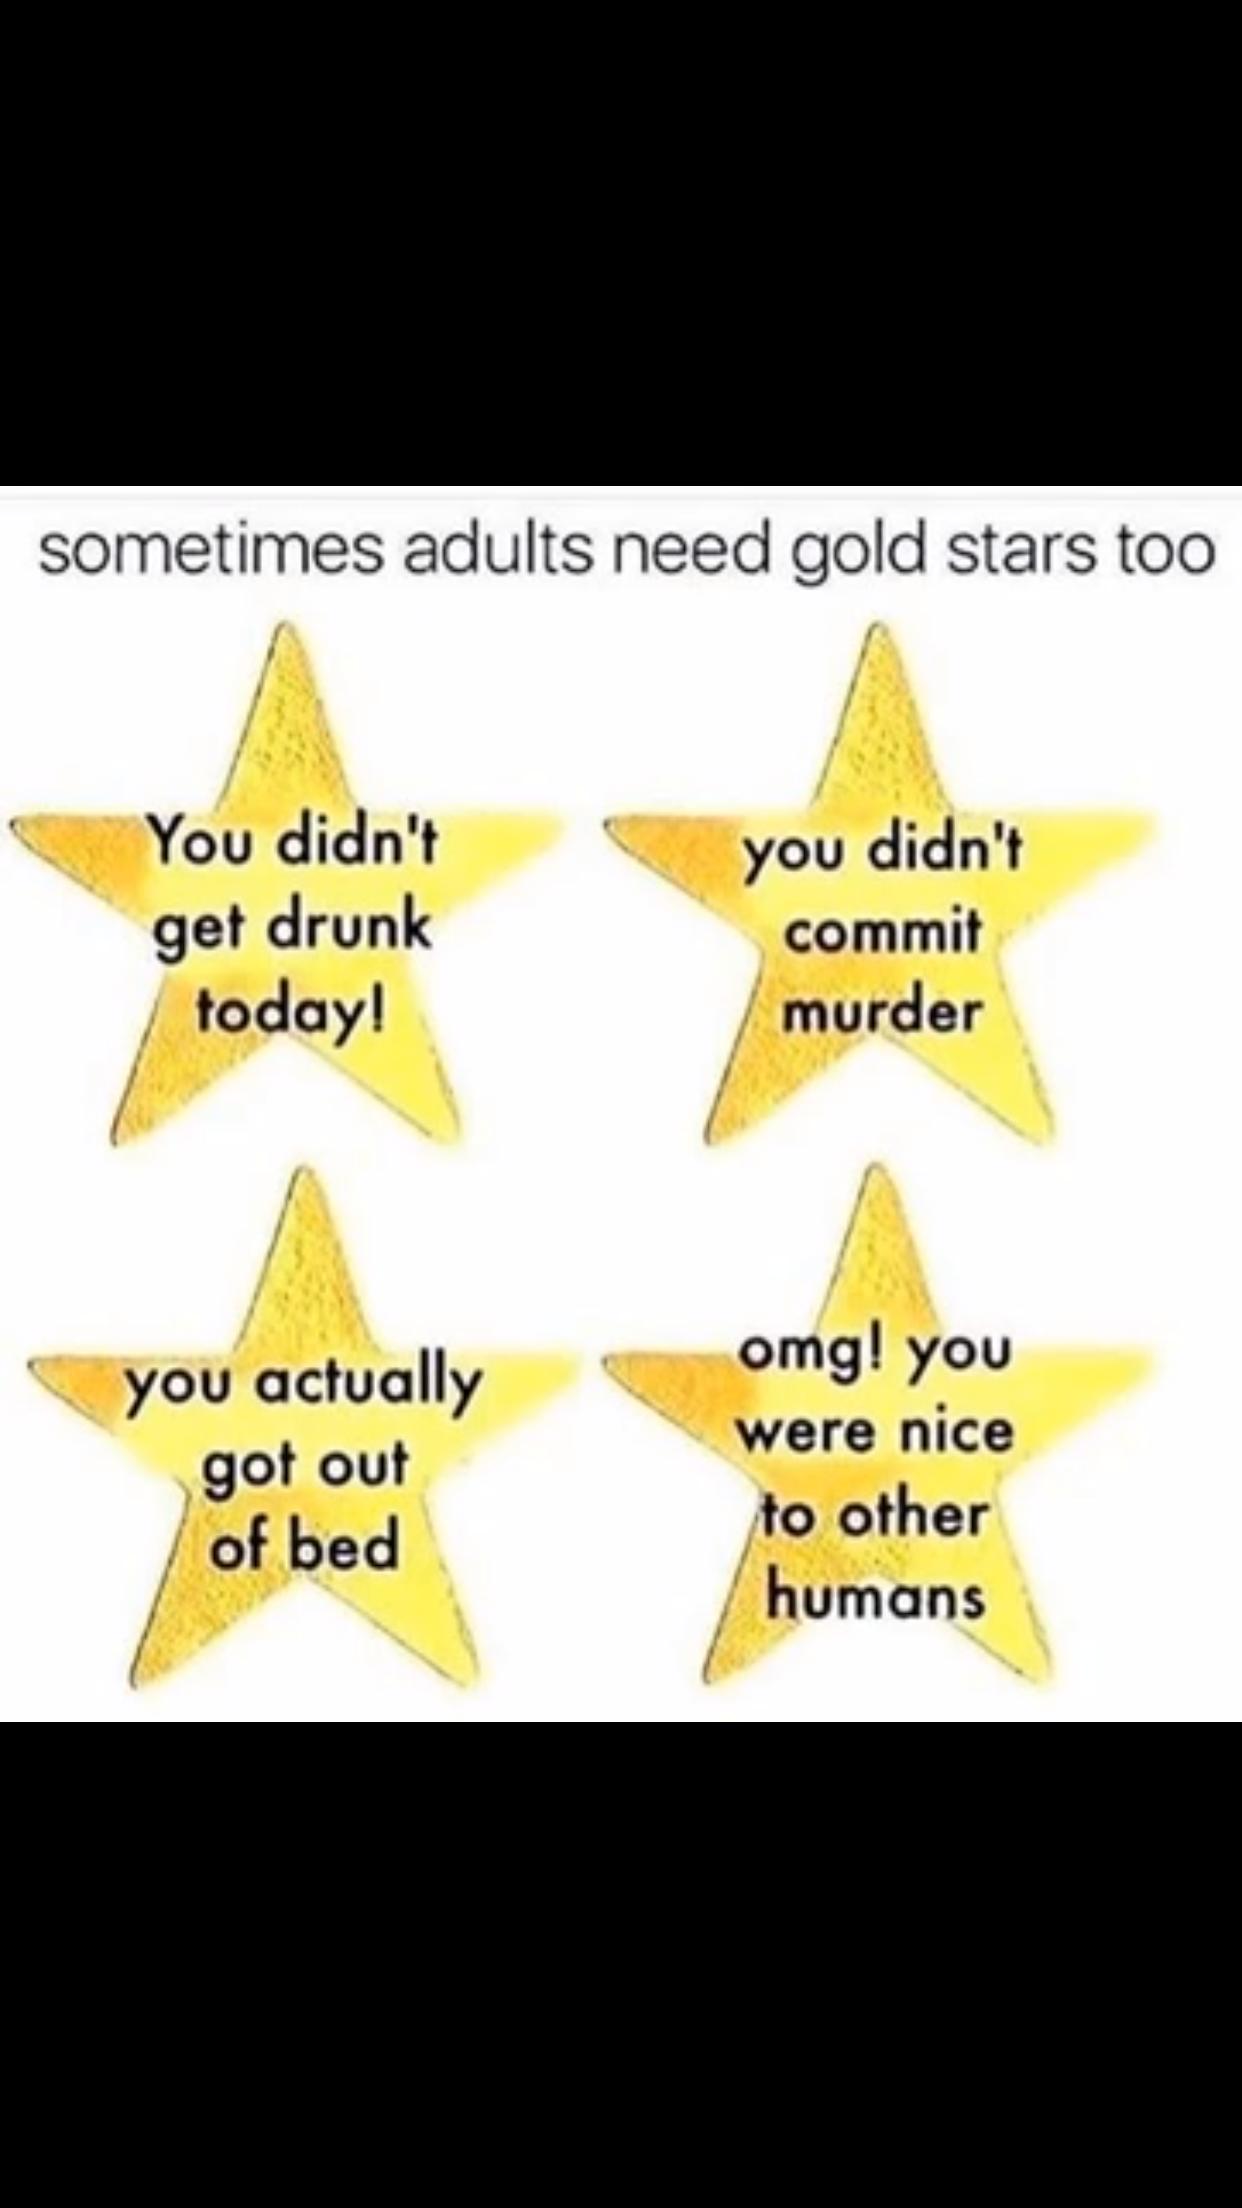 Pin by Cat Cordeiro on LOLZ Gold stars, Haha meme, Adult